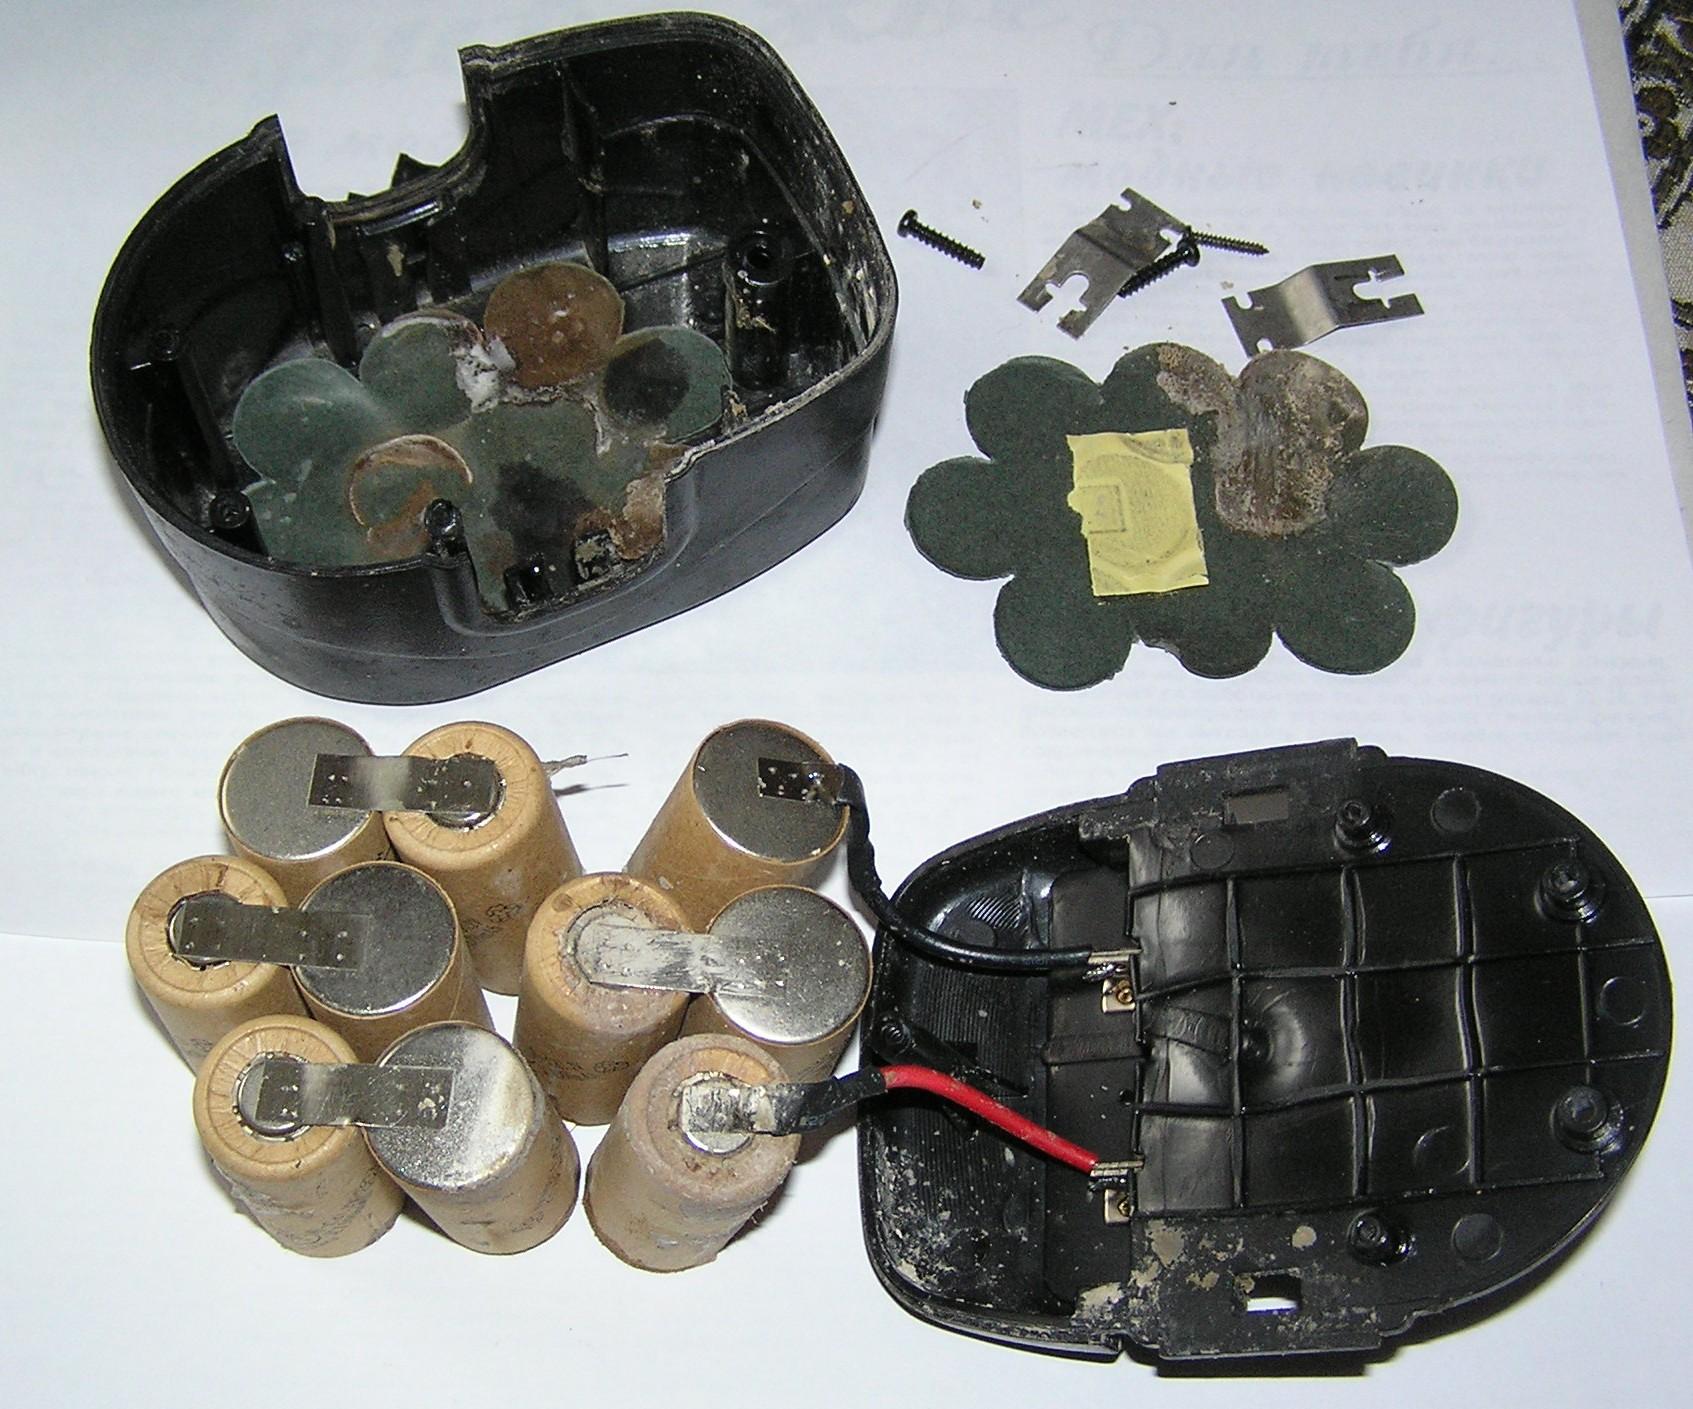 Ремонт аккумулятора макита своими руками